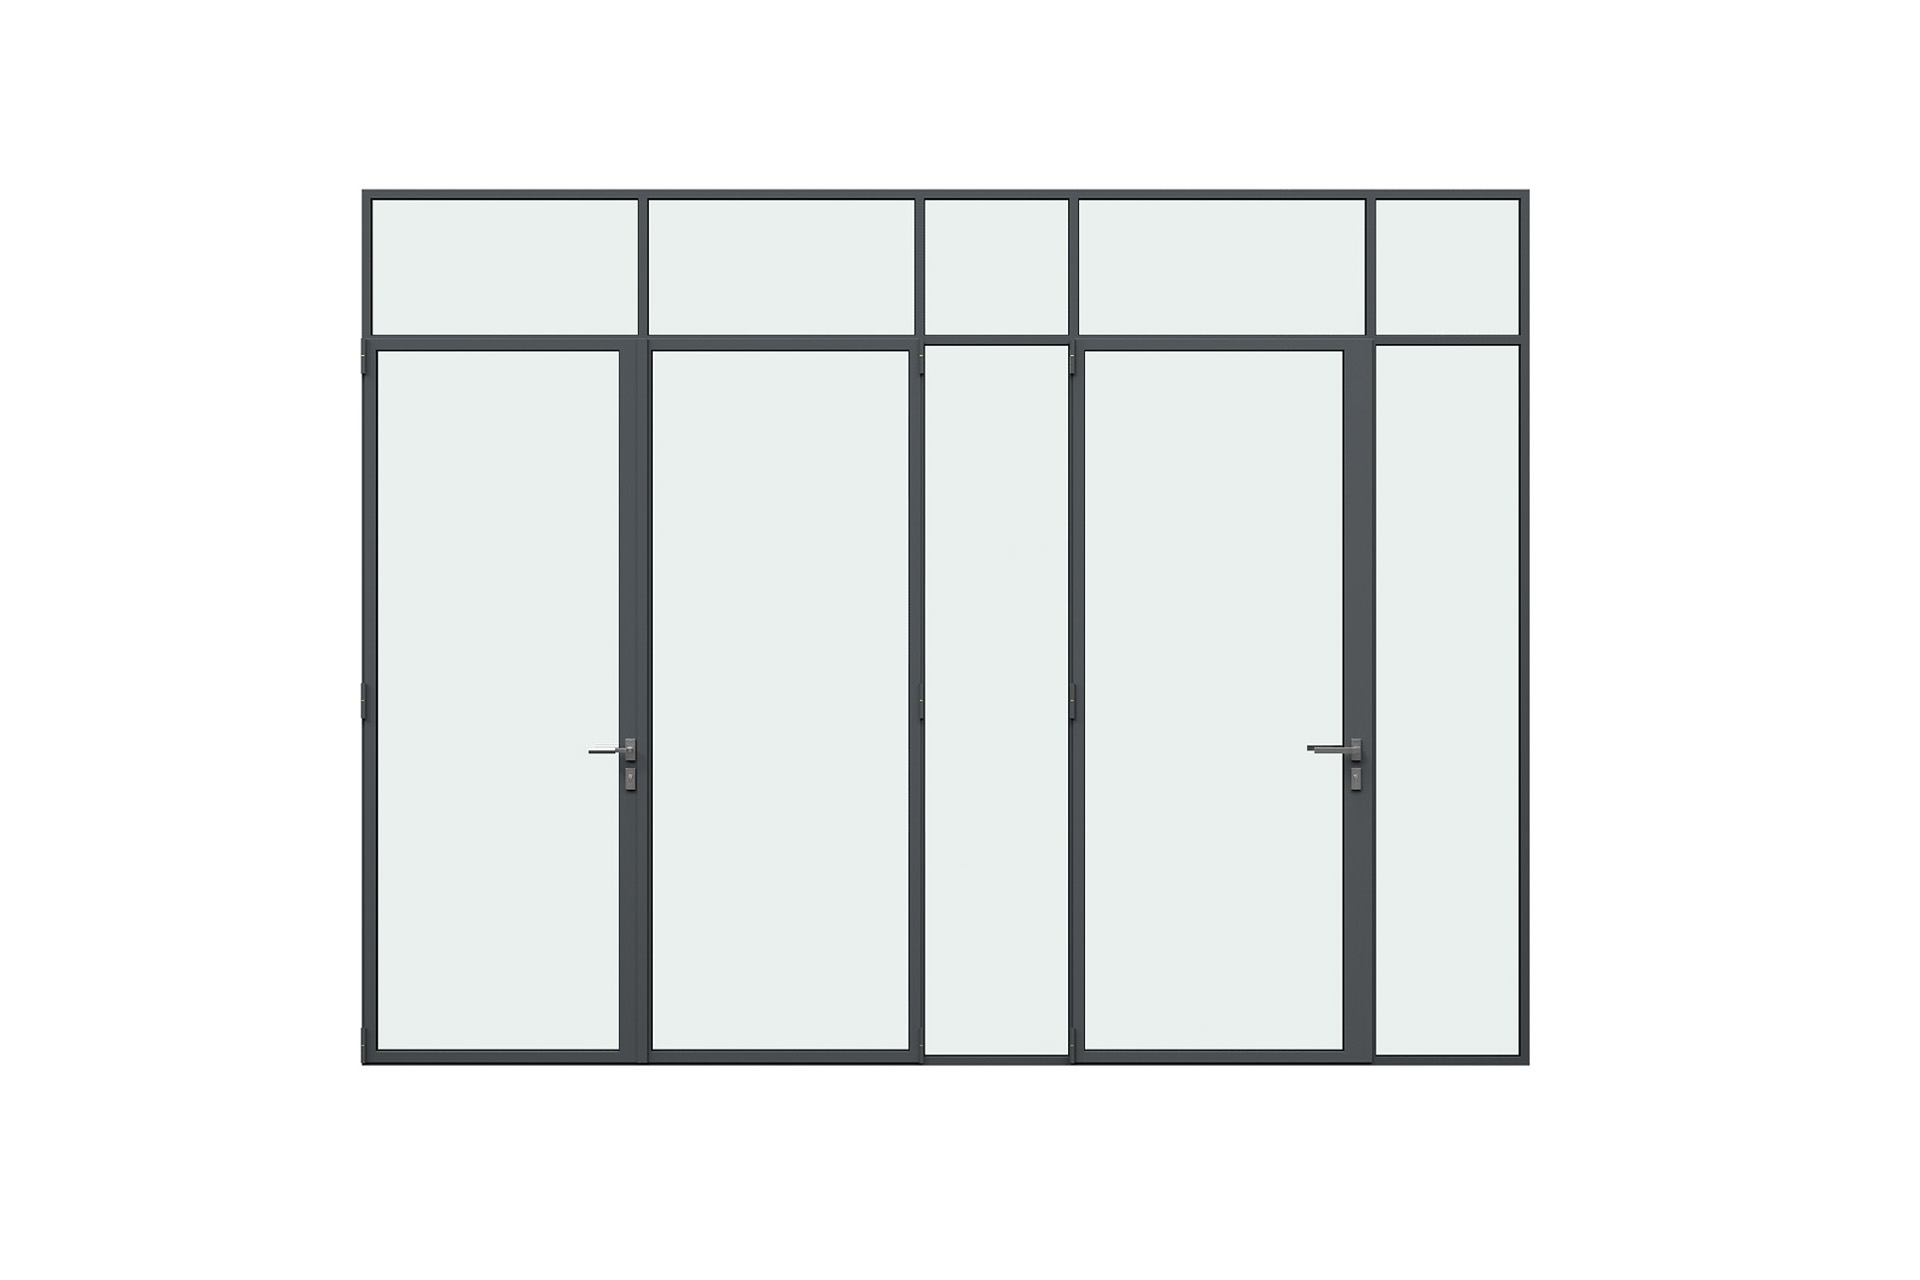 3d rendering front view of MHB steel lock mullion doors